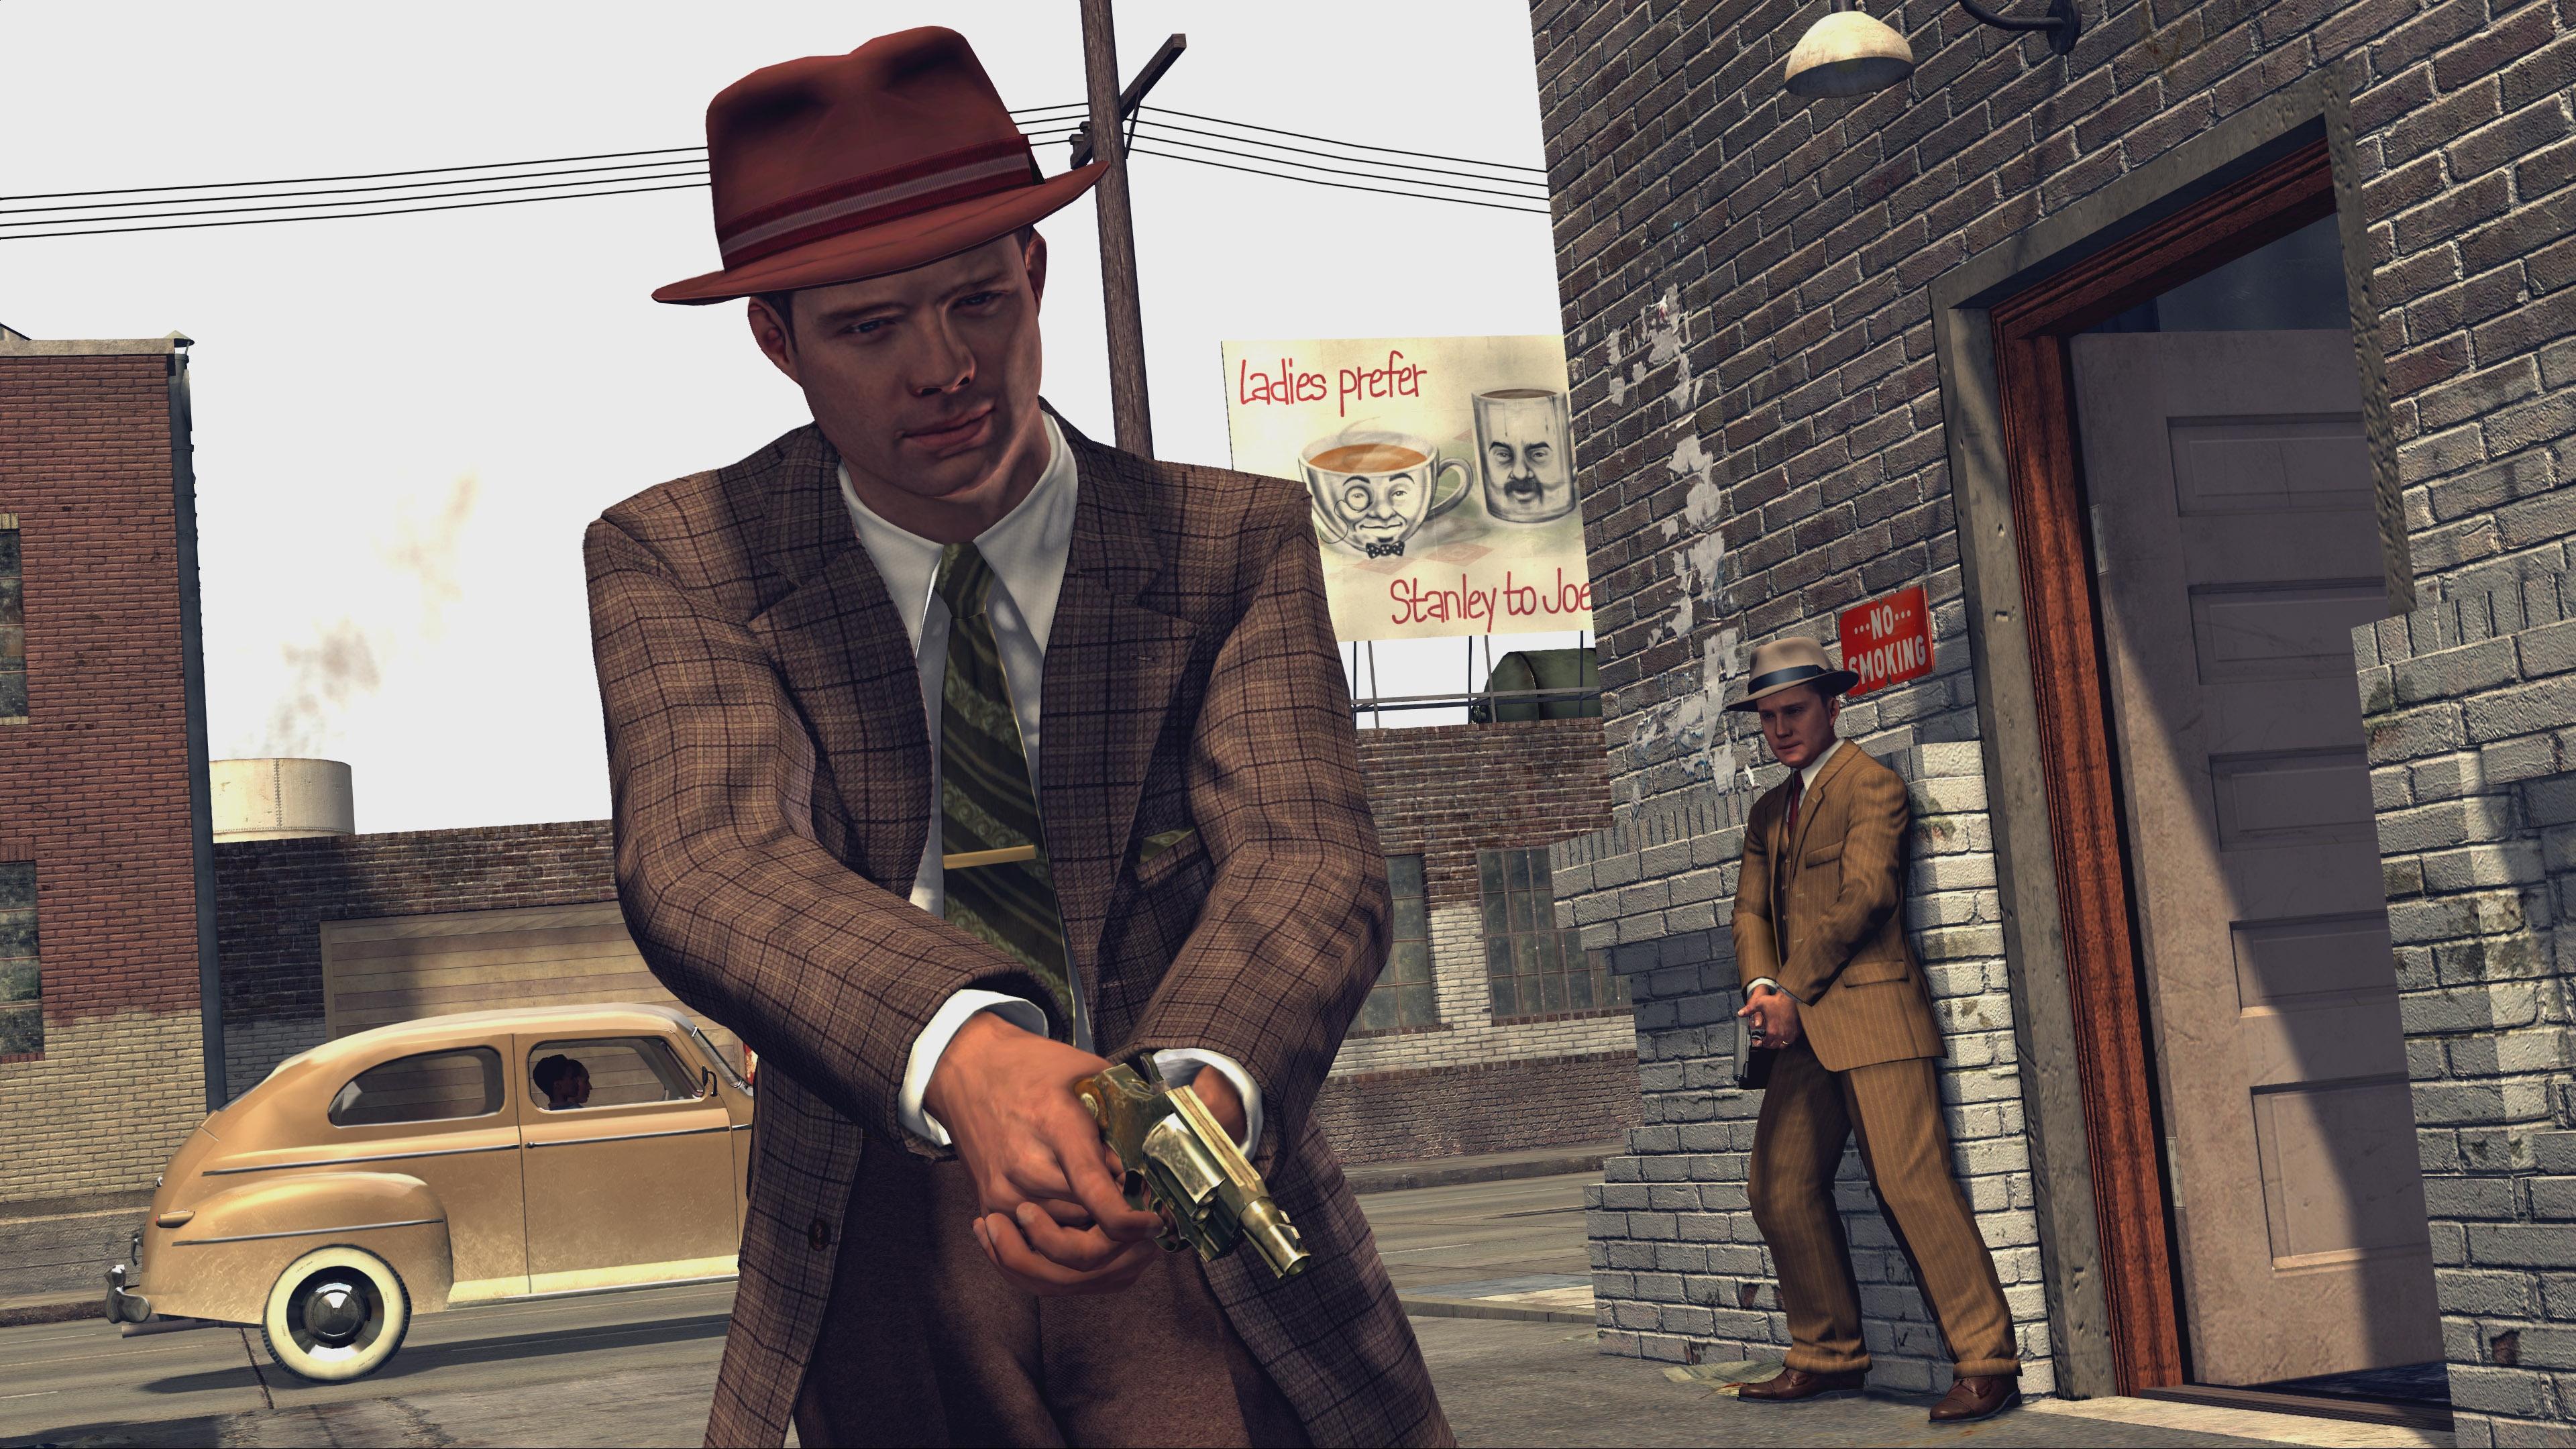 L.A. Noire | WW (4979dee7-4331-4e3b-b3f9-1096d83299da)